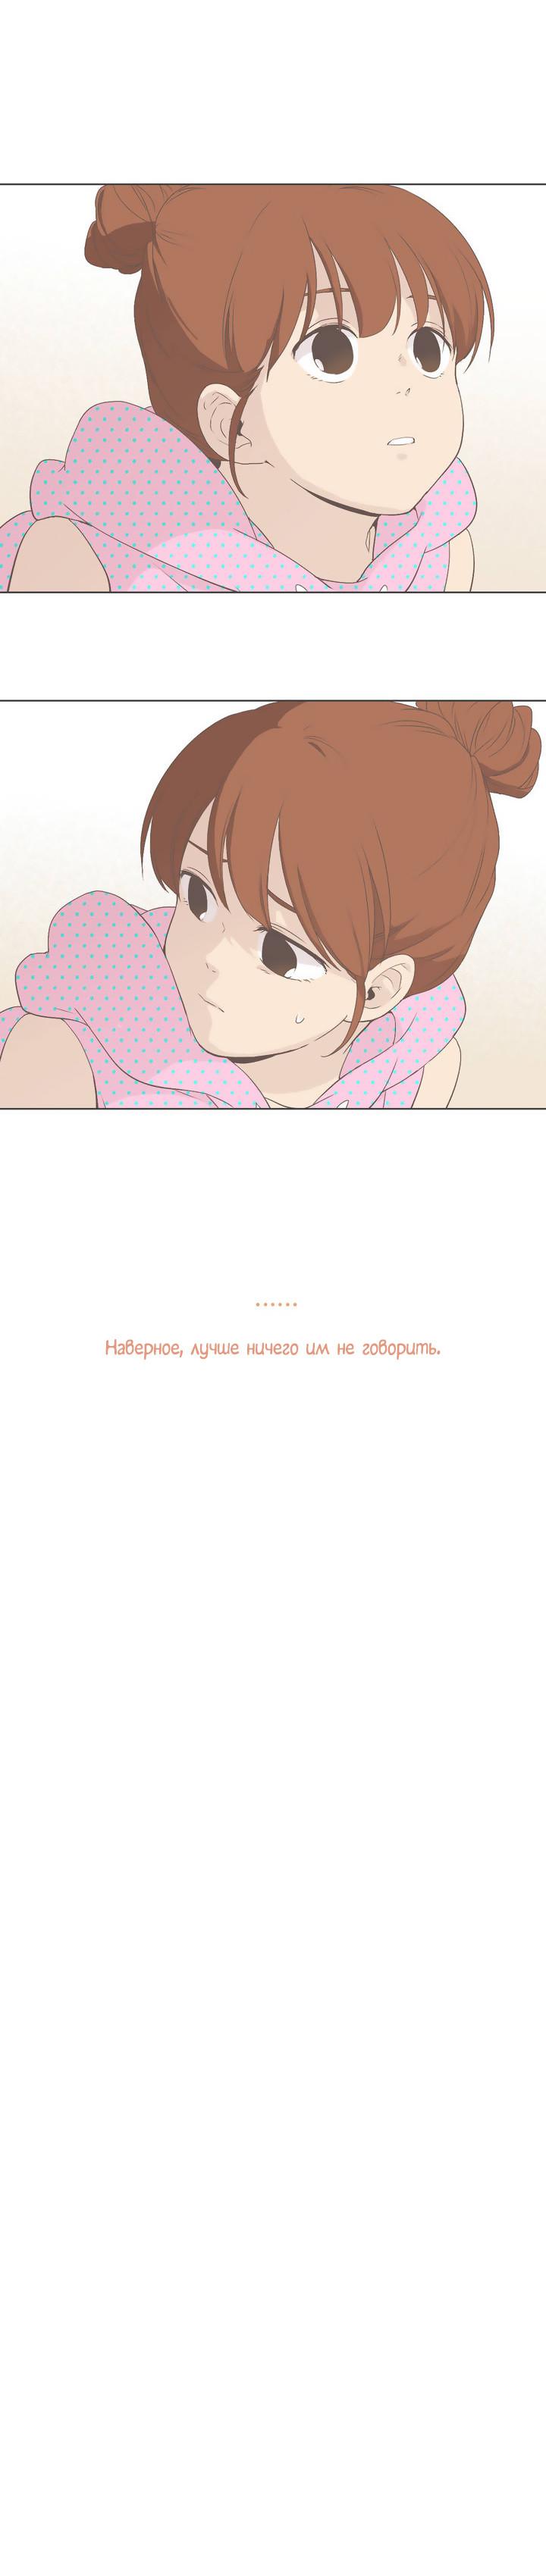 https://r1.ninemanga.com/comics/pic2/12/22860/316659/1484809974996.jpg Page 9